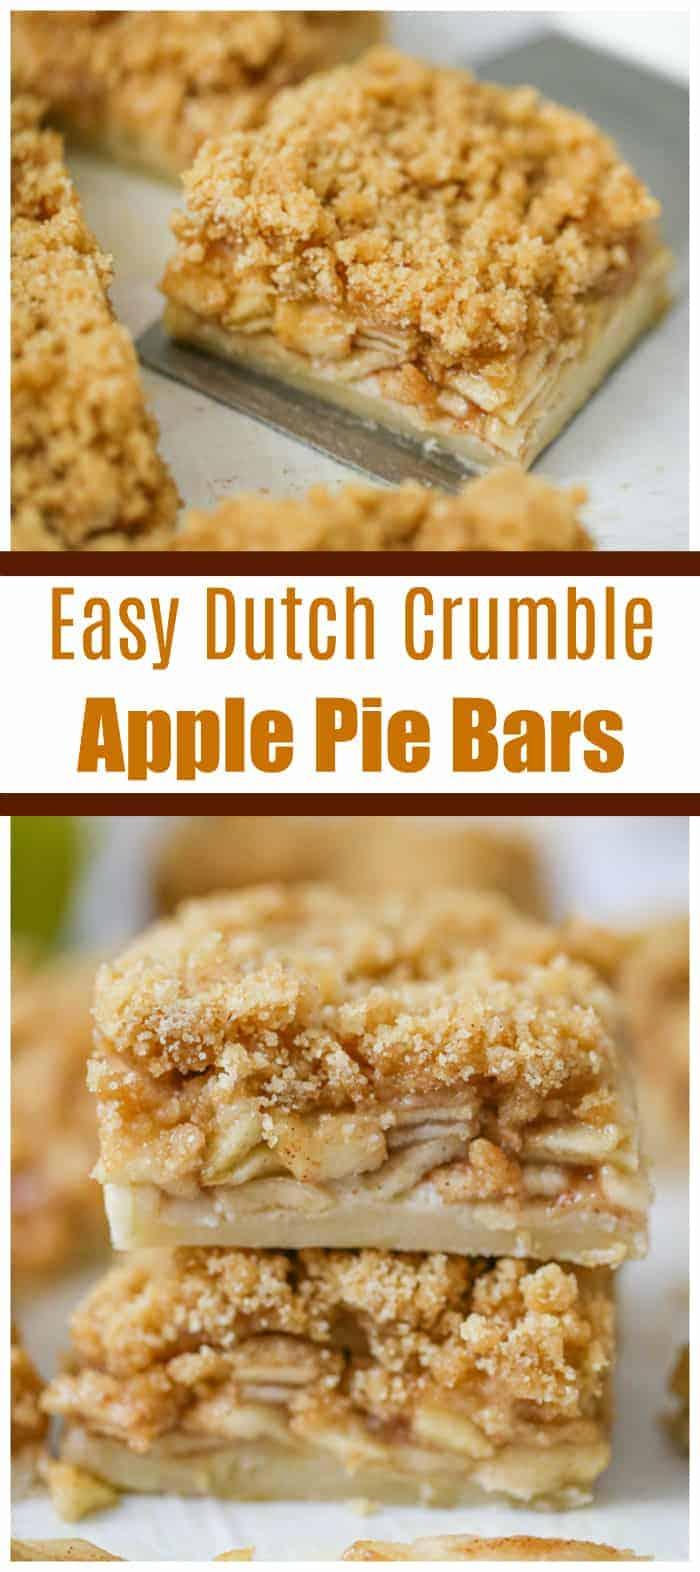 Easy Dutch Crumble Apple Pie Bars